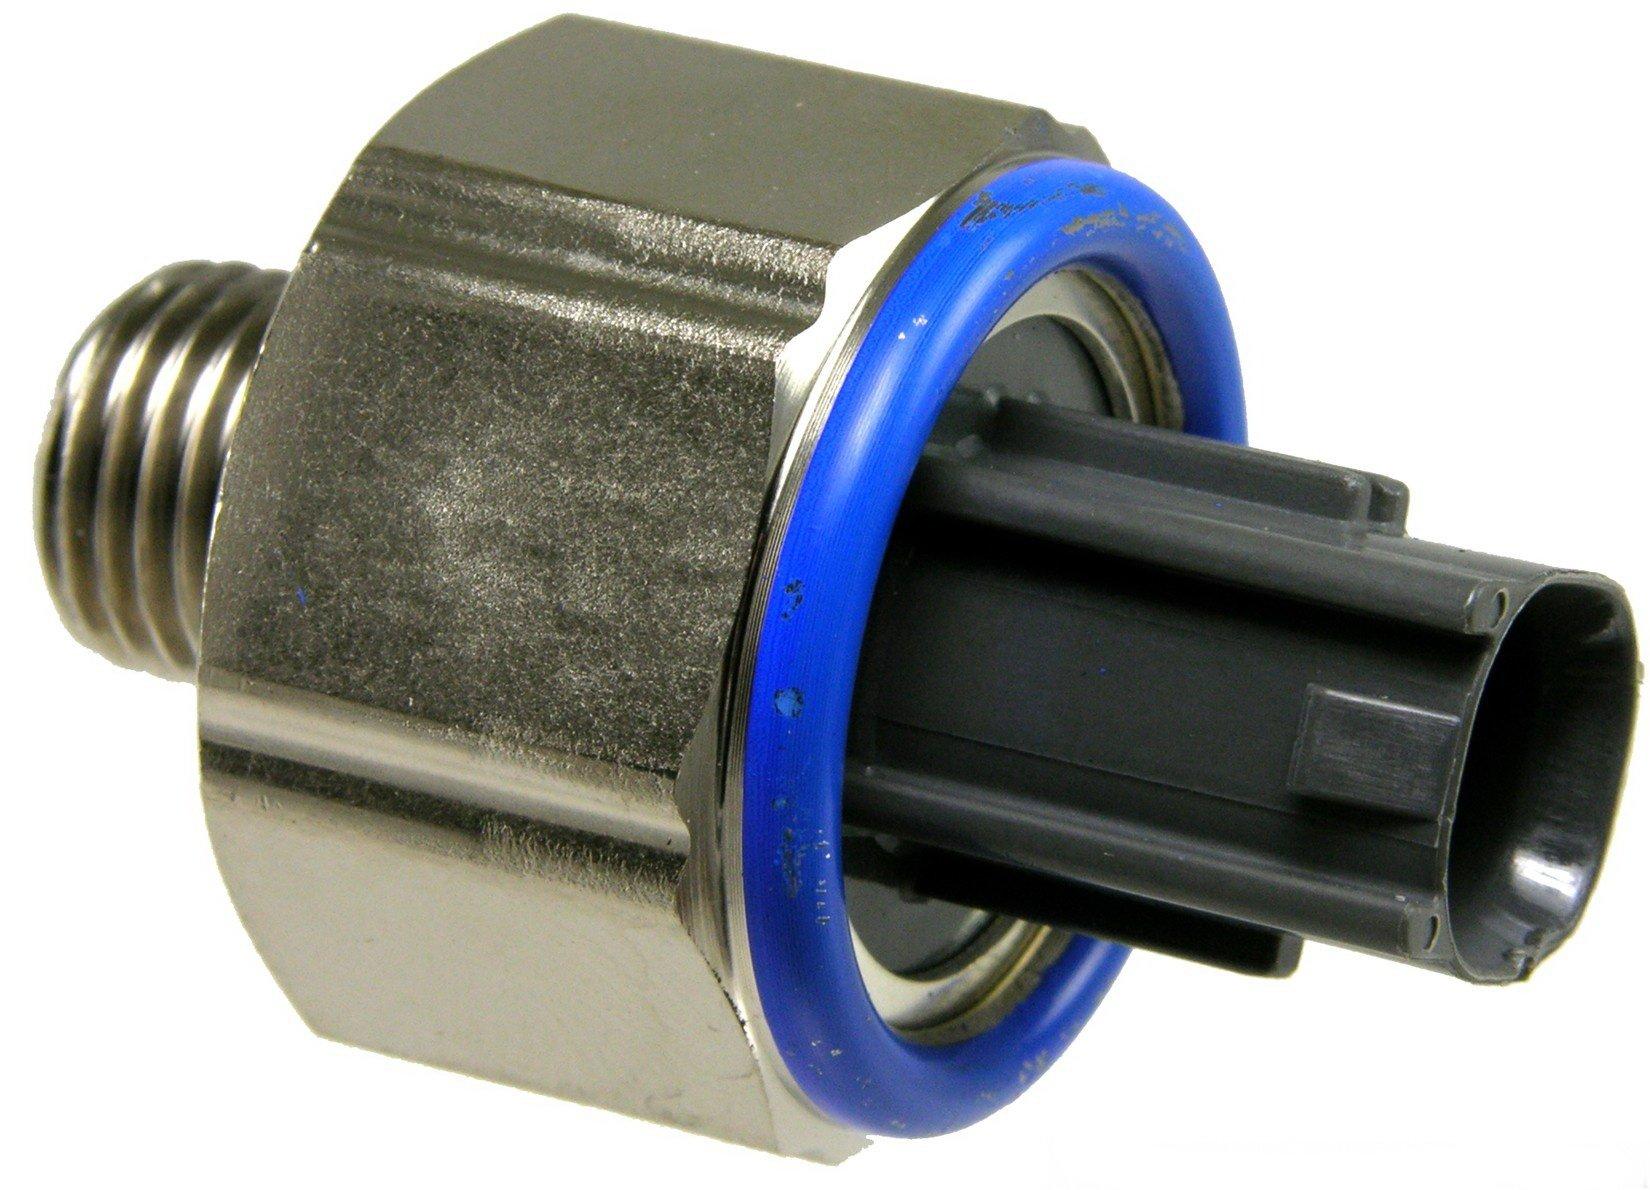 Cheap Toyota 4runner Knock Sensor Find 1992 Crank Get Quotations 89615 50010 Detonation Fitstoyota 2000 Celica